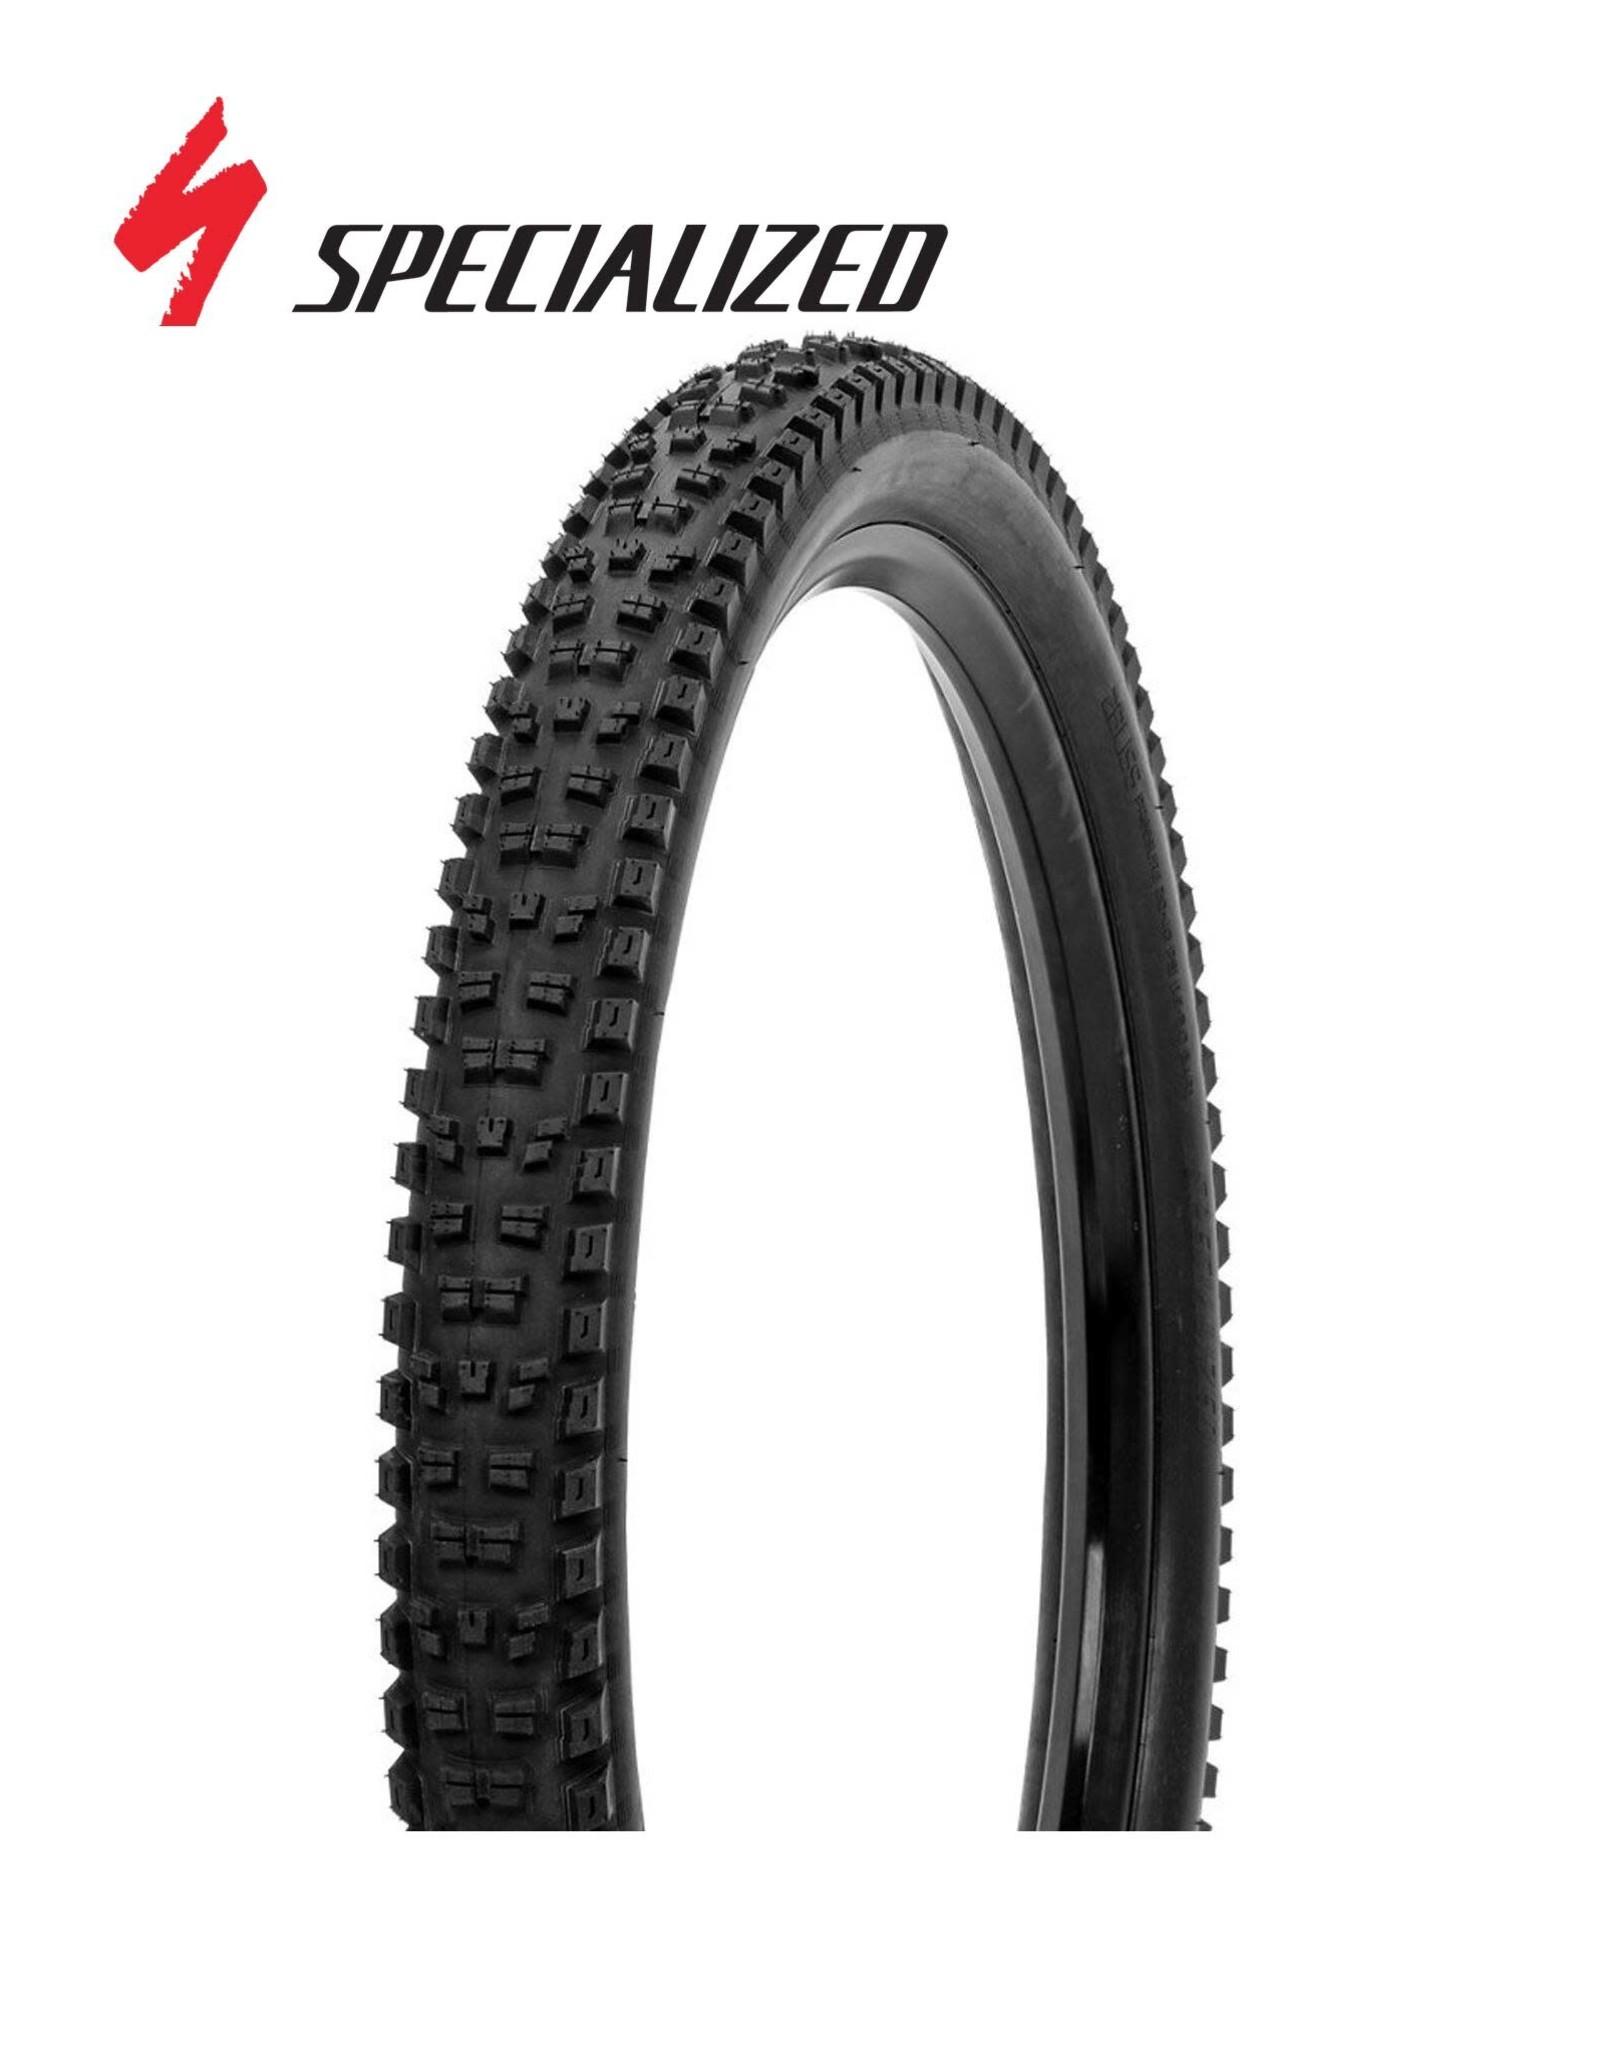 SPECIALIZED Specialized Eliminator 29 x 2.6 GRID TRAIL 2BR Tyre